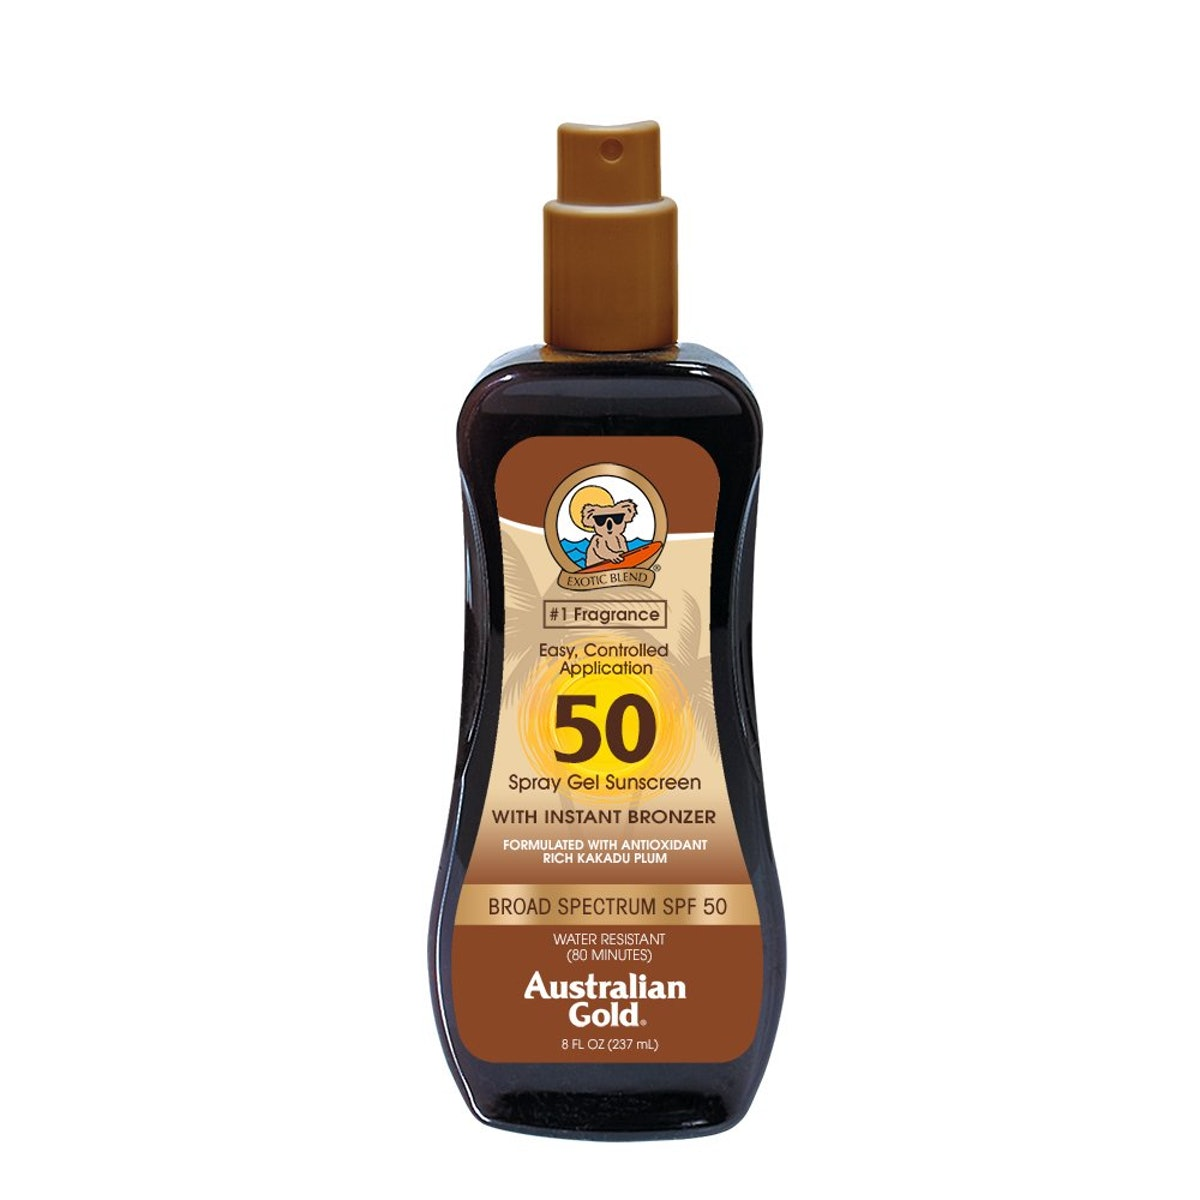 Australian Gold Spray Gel Sunscreen With Instant Bronzer SPF 50